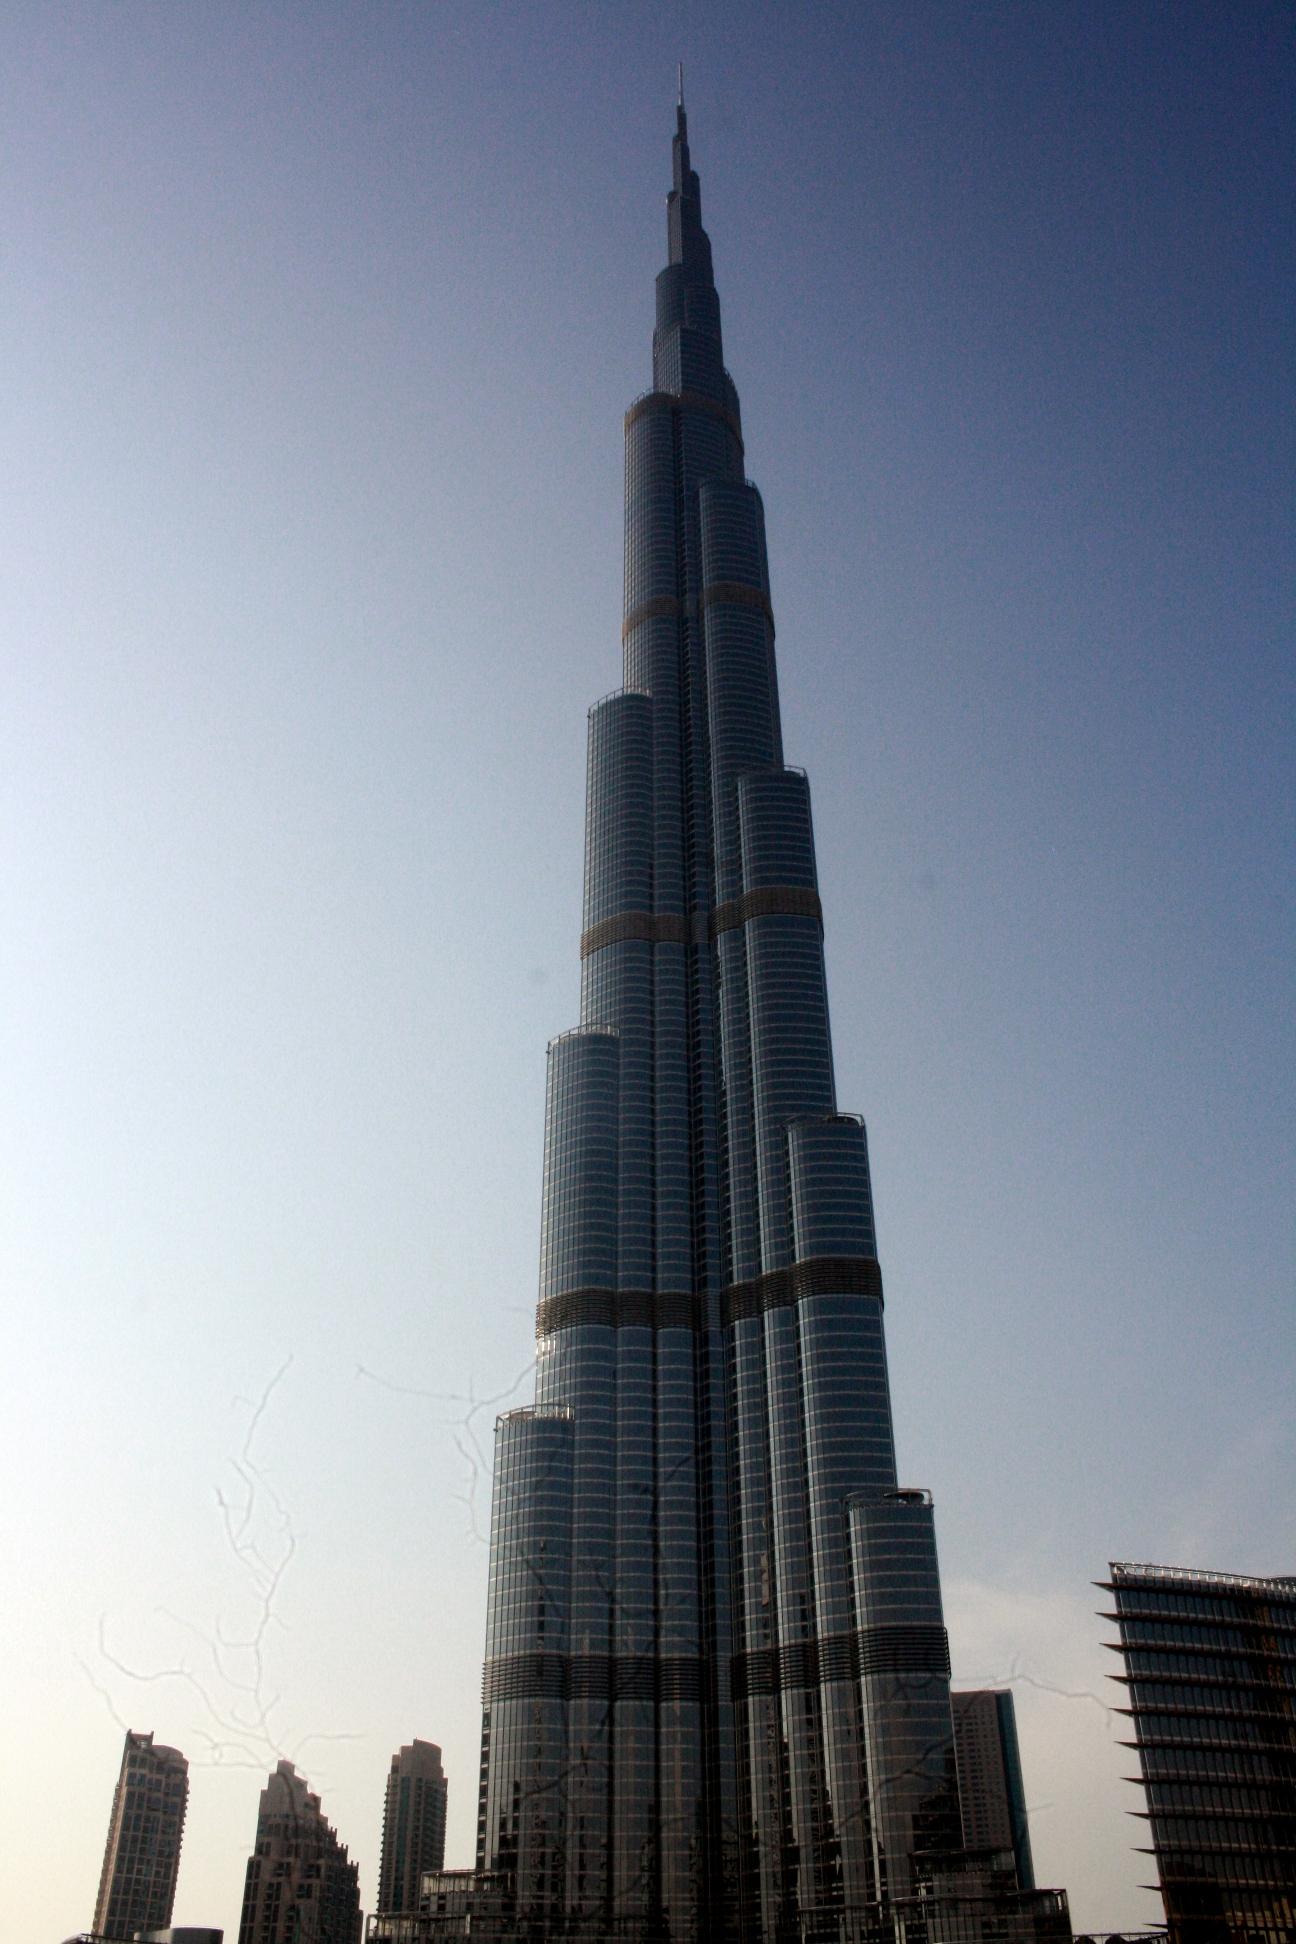 the visit 7 burj khalifa the adventures of i igo boy. Black Bedroom Furniture Sets. Home Design Ideas